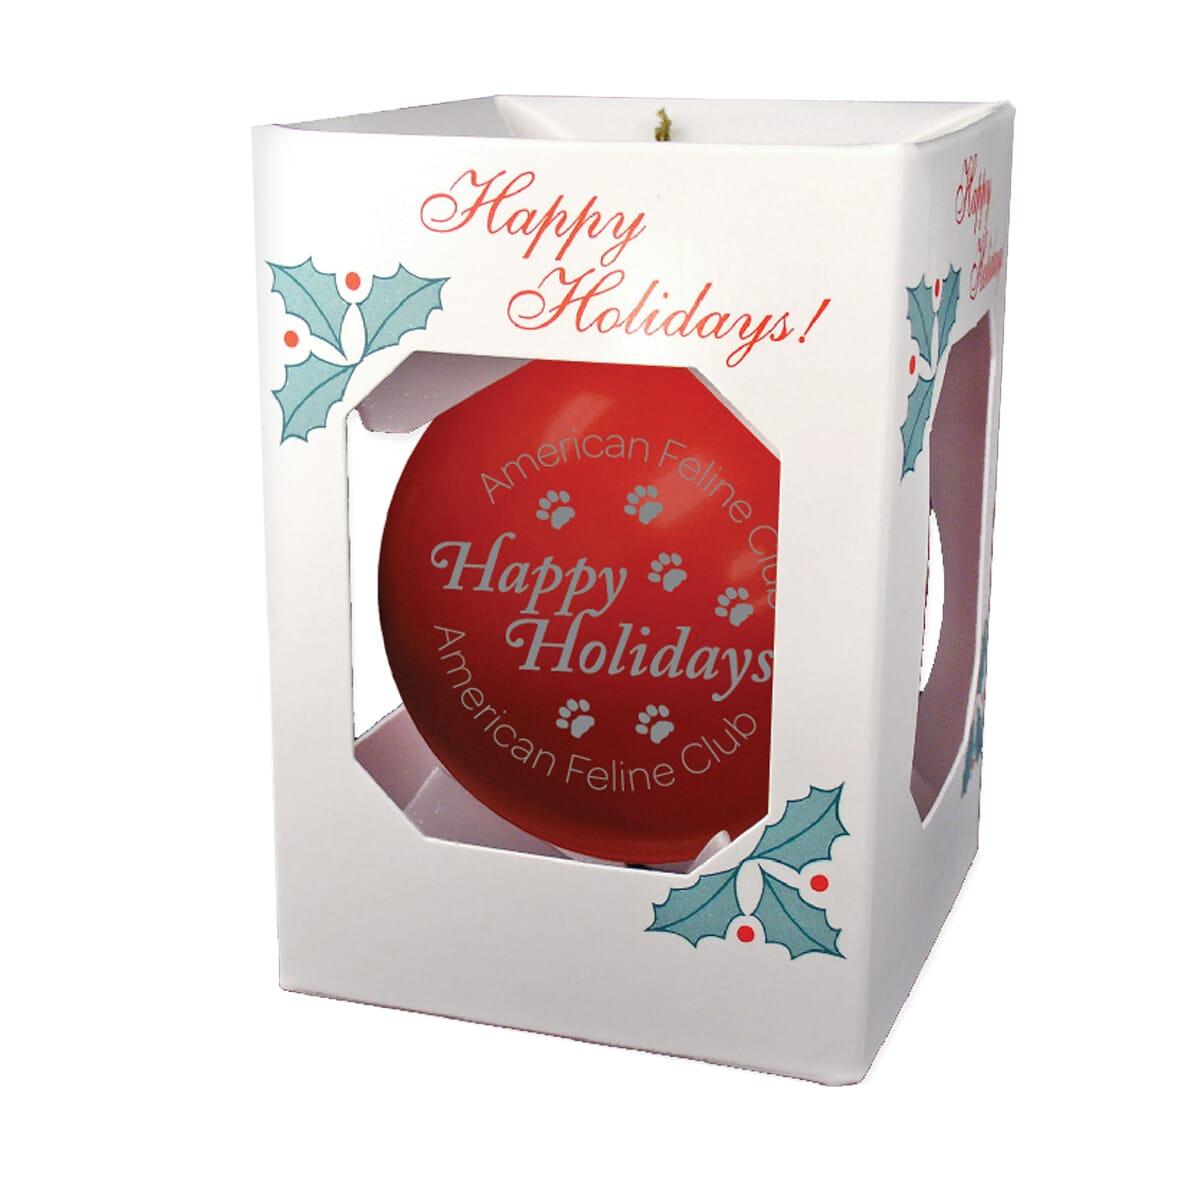 USA-Made Holiday Ornament